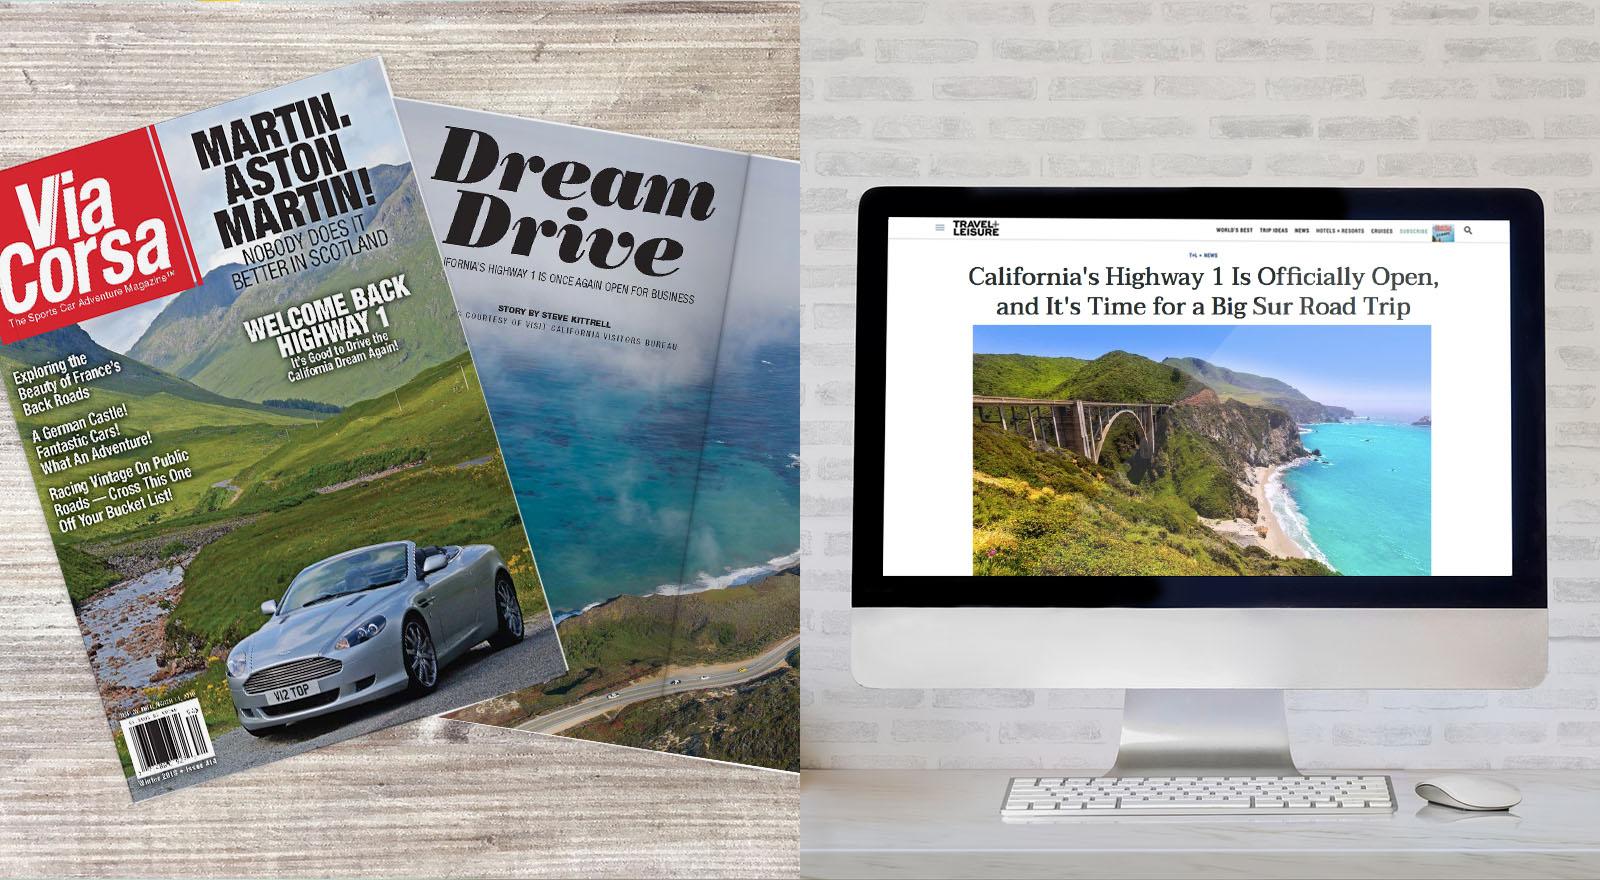 Dream Drive Magazine and Laptop